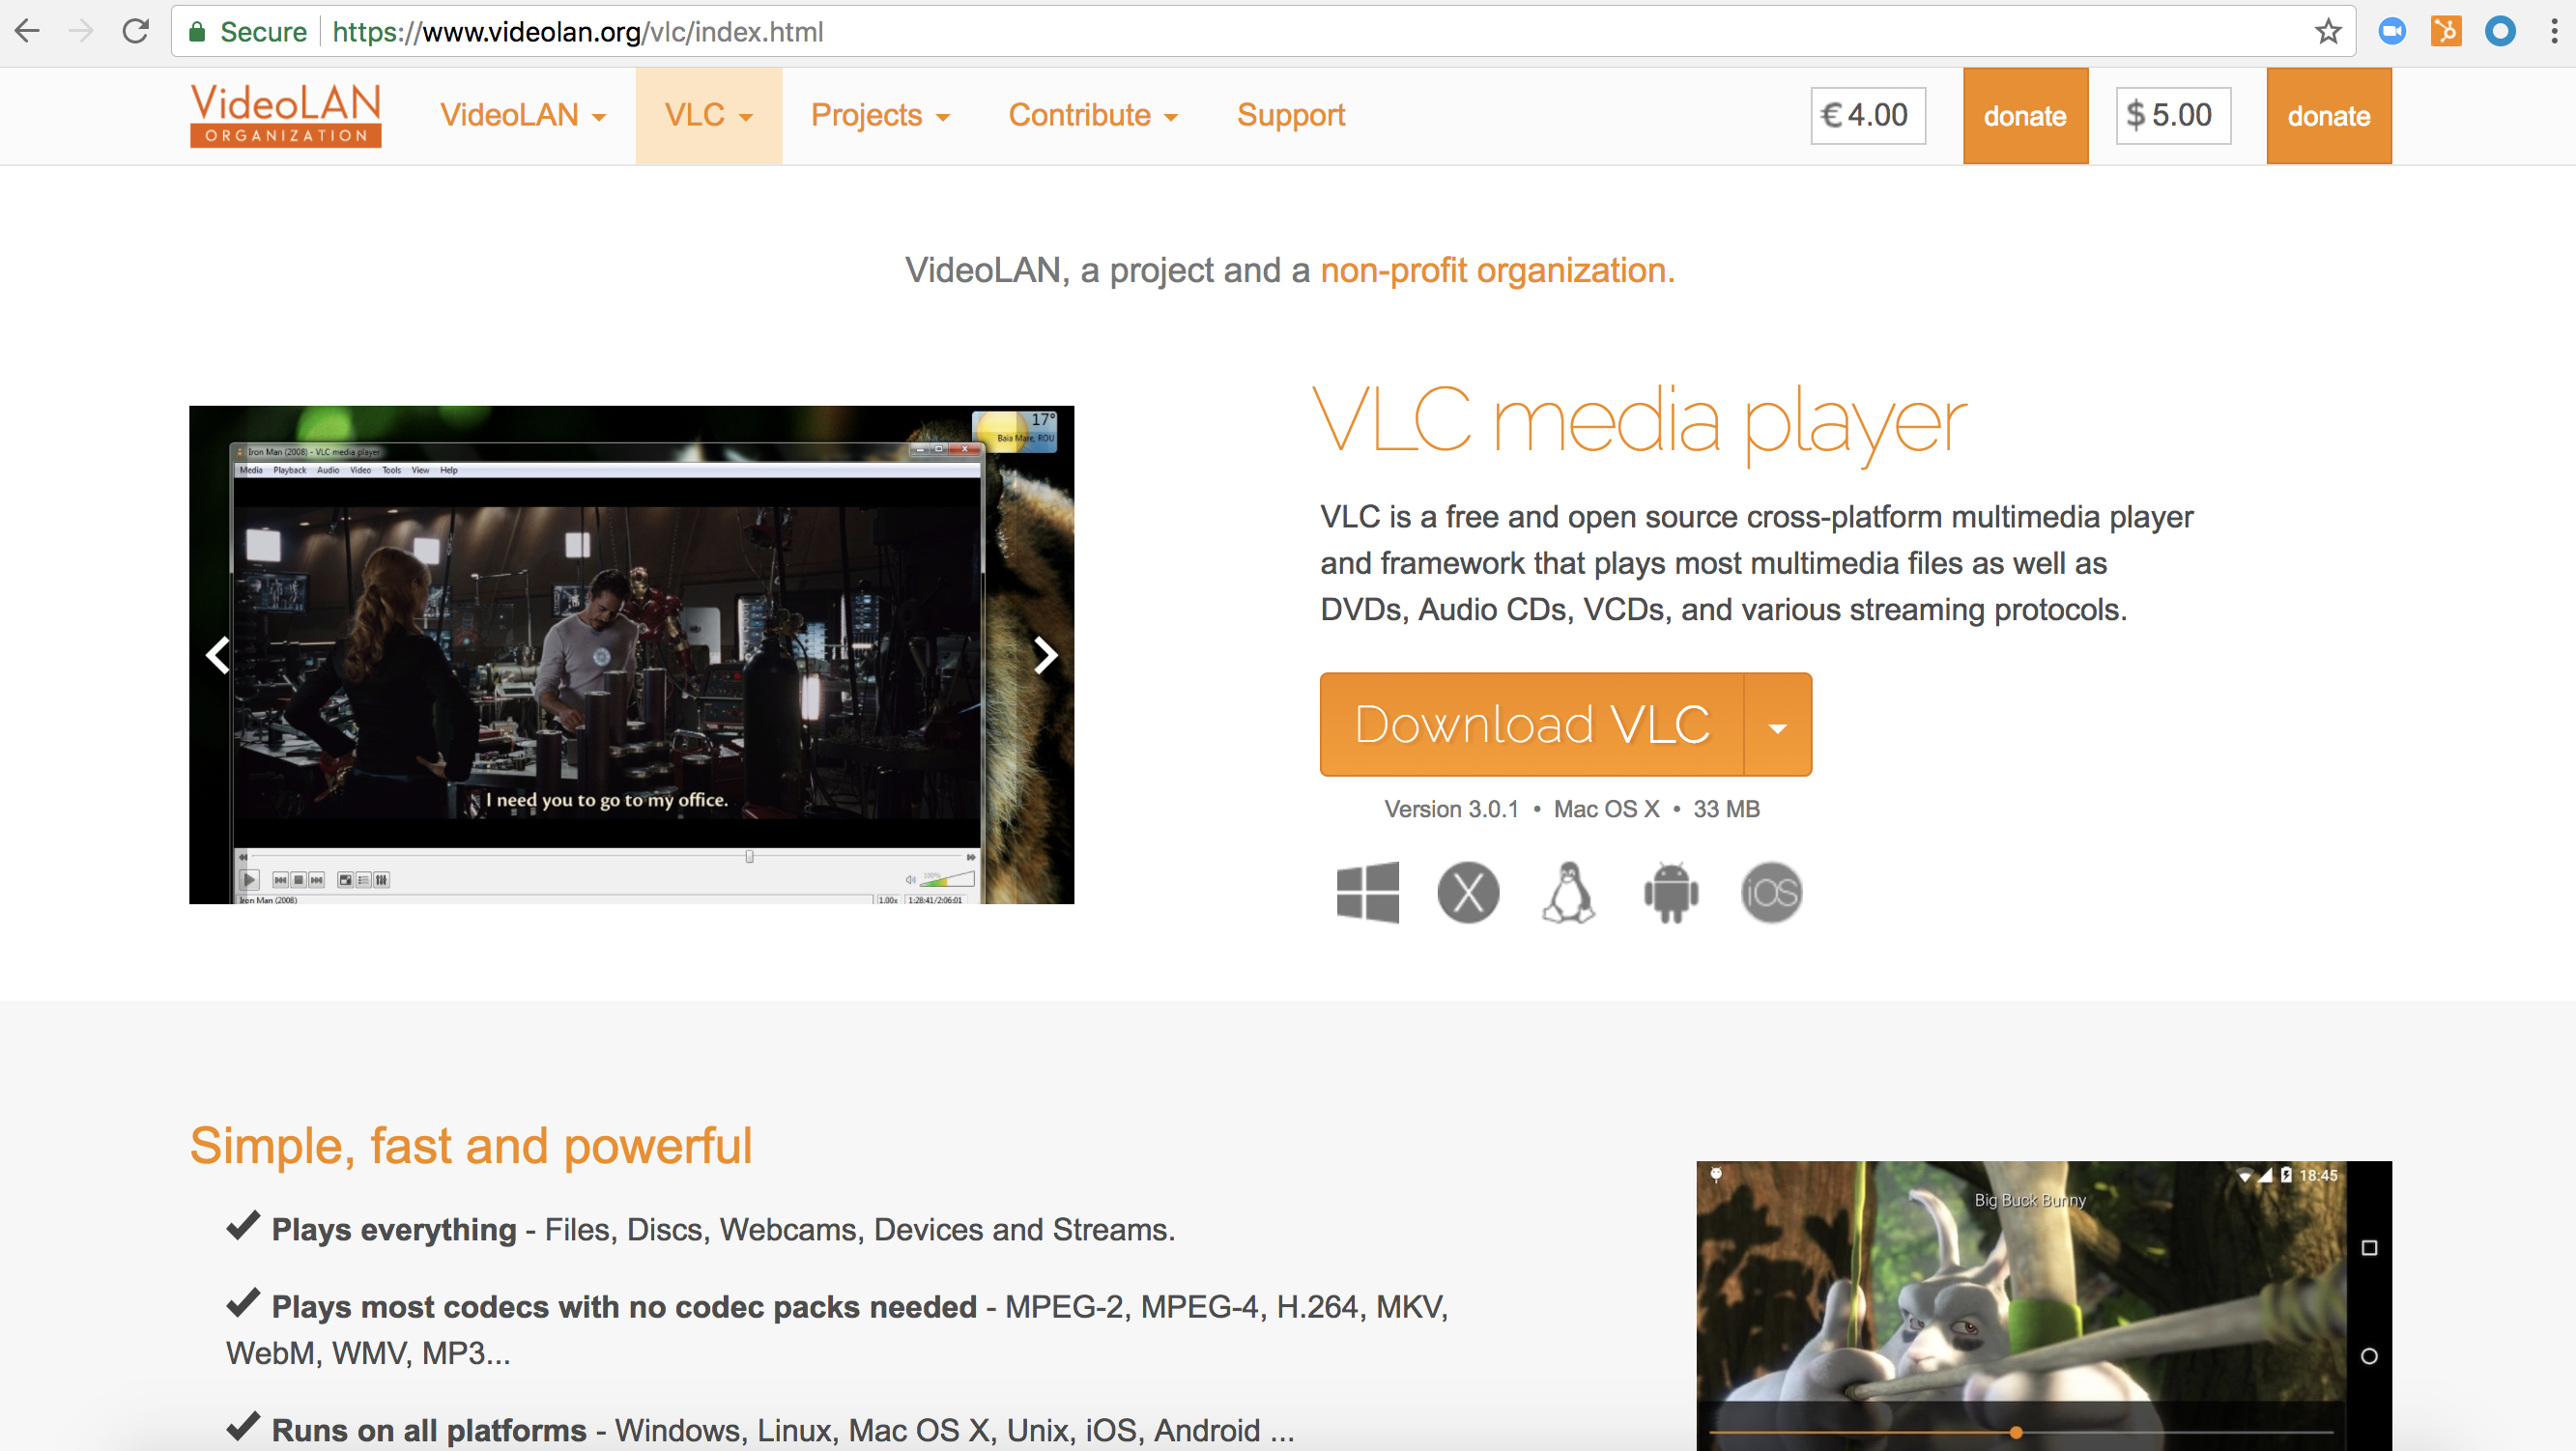 VLC media player homepage